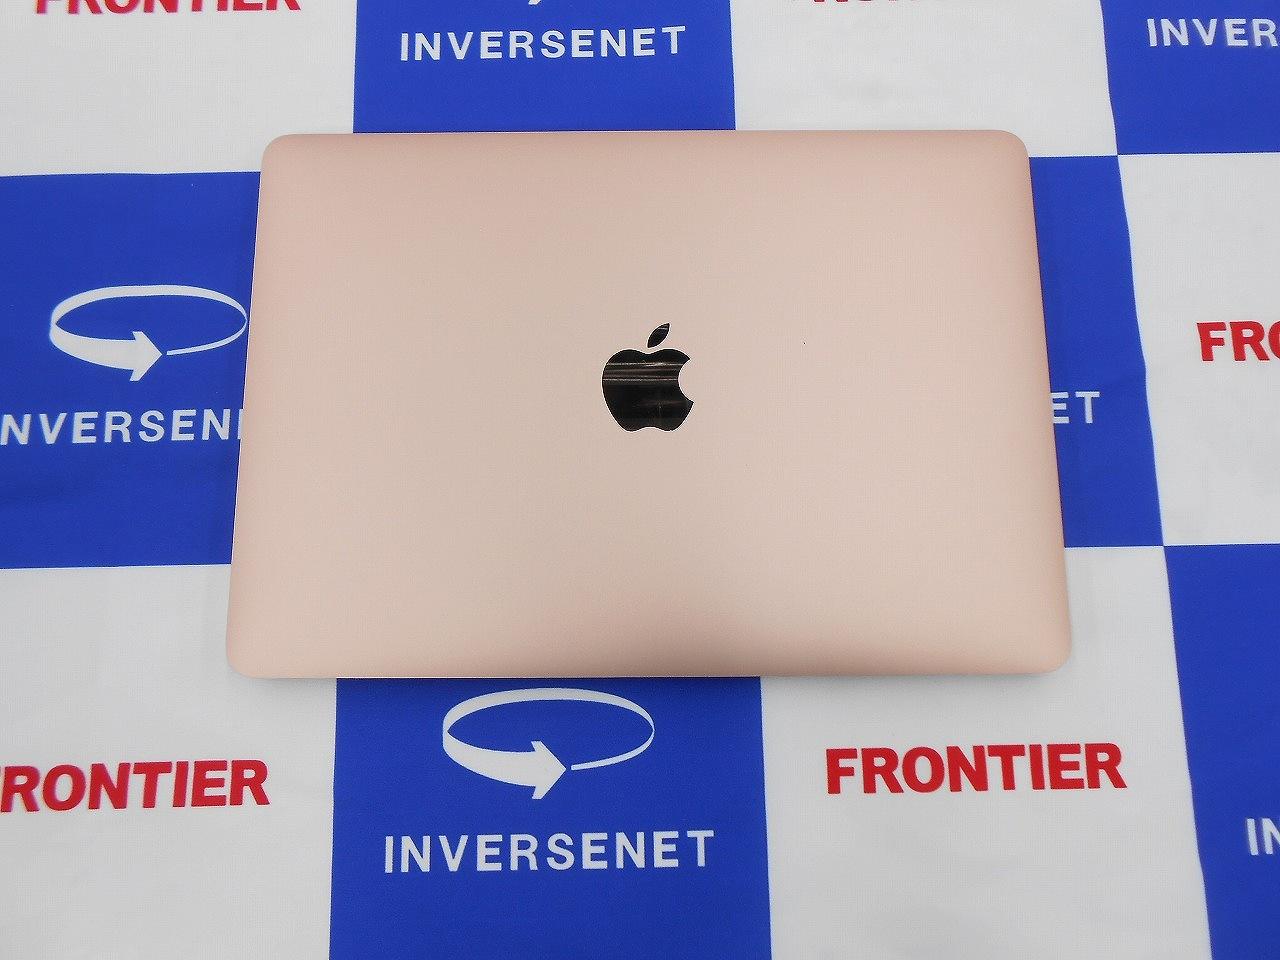 Aランク【決算セール】【中古】 Apple MacBook MRQN2J/A/Core m3 1.2GHz/メモリ8GB/SSD256GB/12インチ/Mac OS X Catalina10.15.4【3ヶ月保証】【足立店発送】